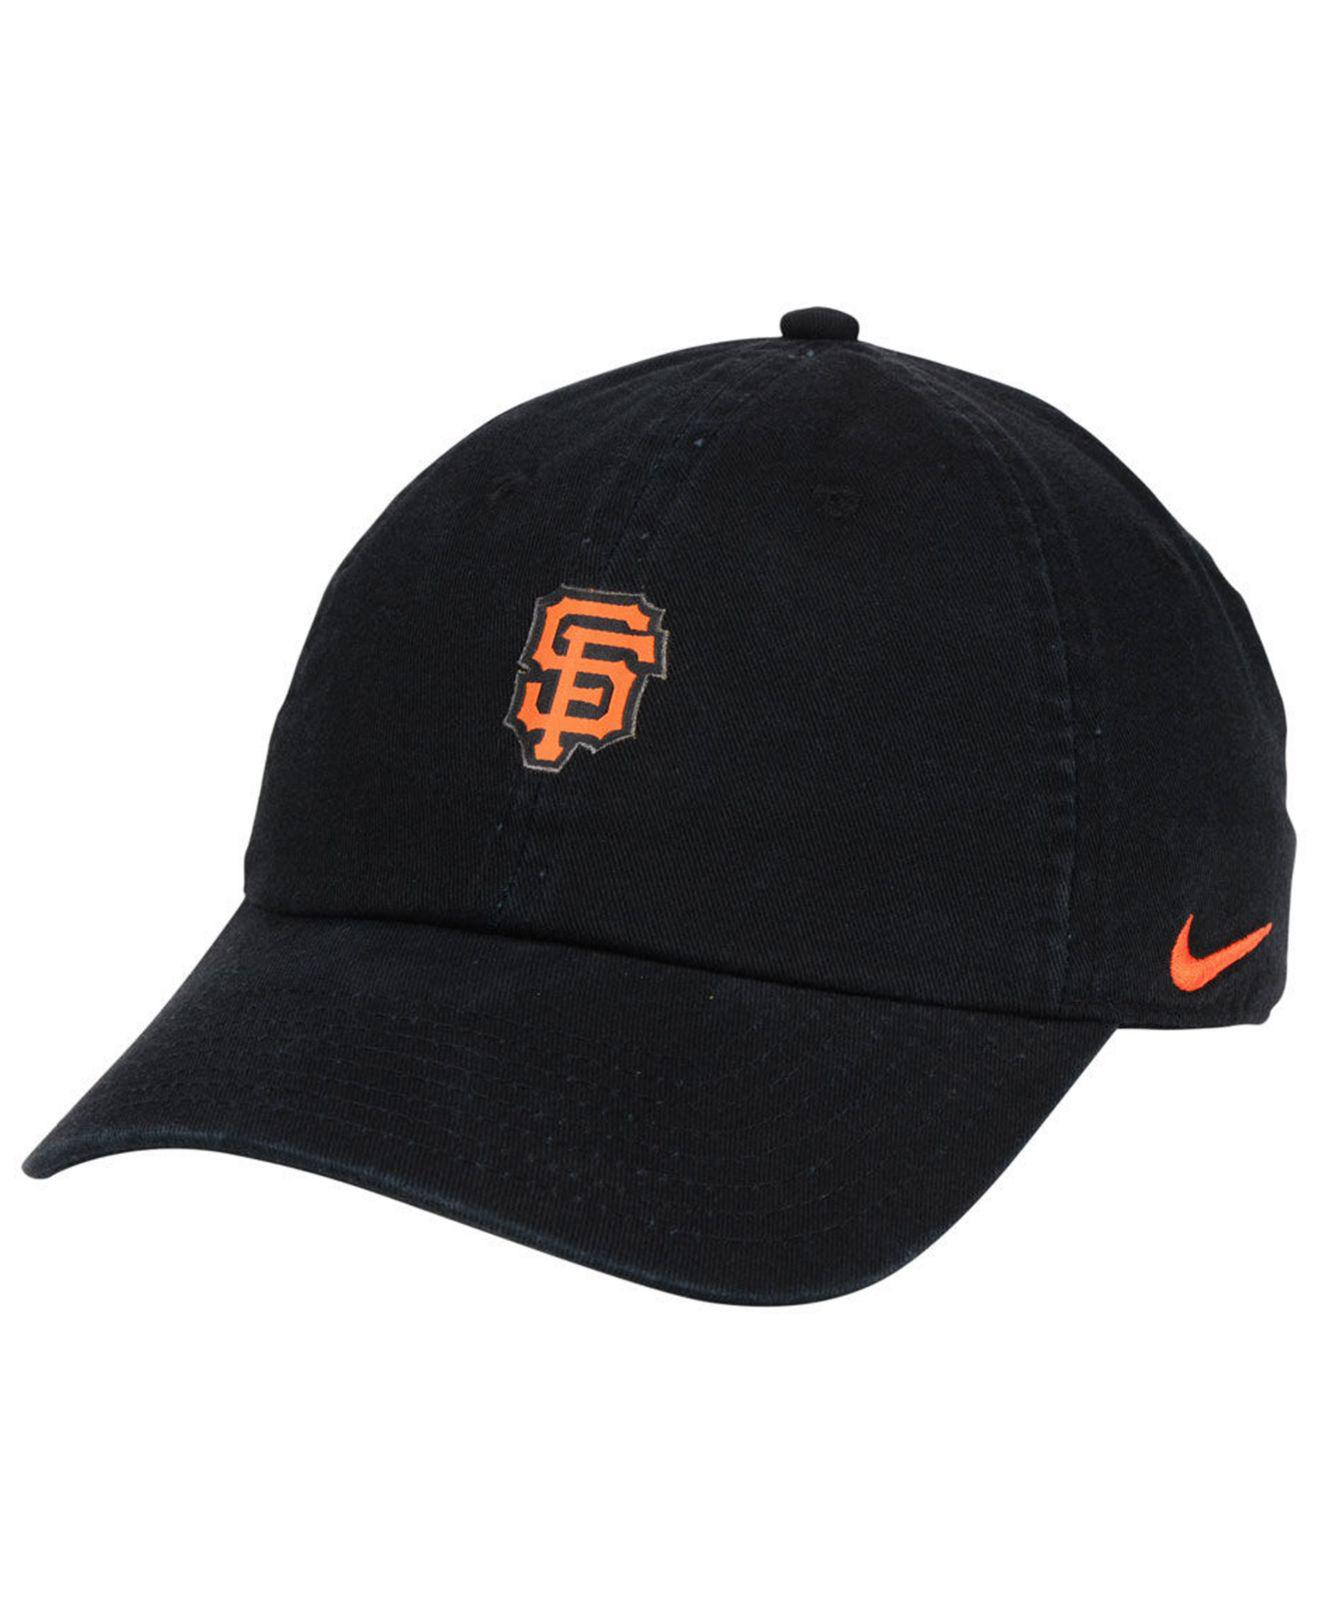 61d1088244f Lyst - Nike San Francisco Giants Micro Cap in Black for Men